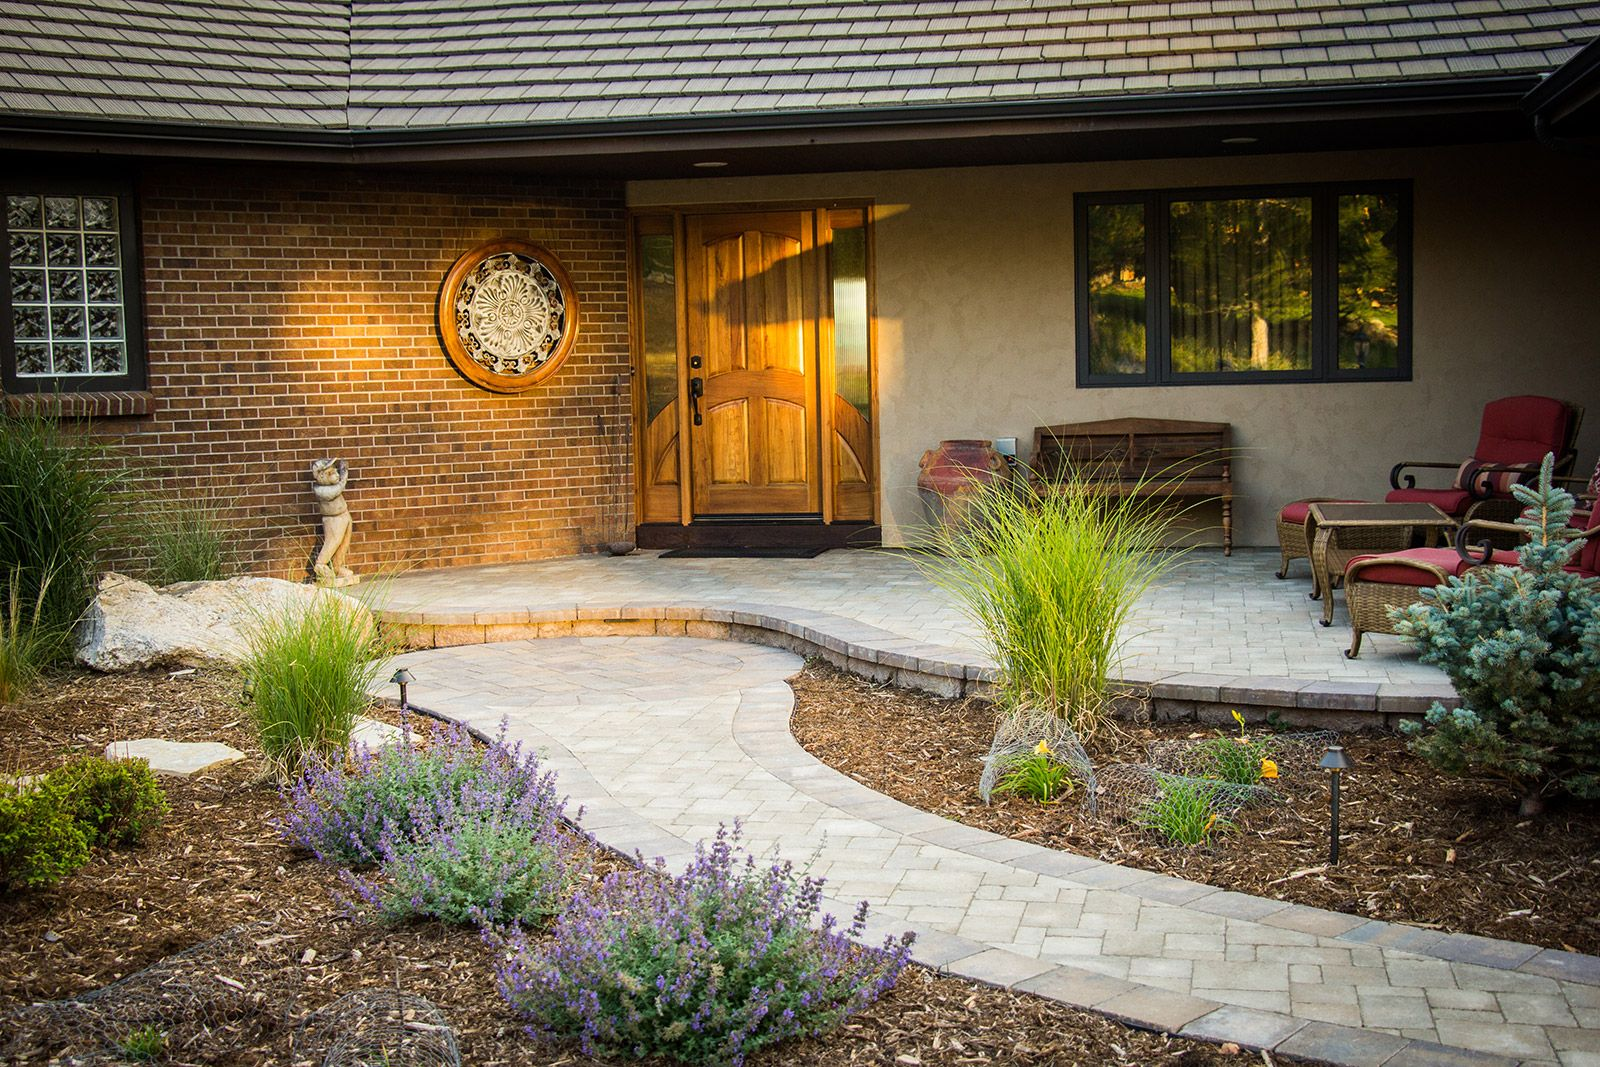 Hardscapes Portfolio - Elite Landscape & Outdoor Living ... on Elite Landscape And Outdoor Living id=55798